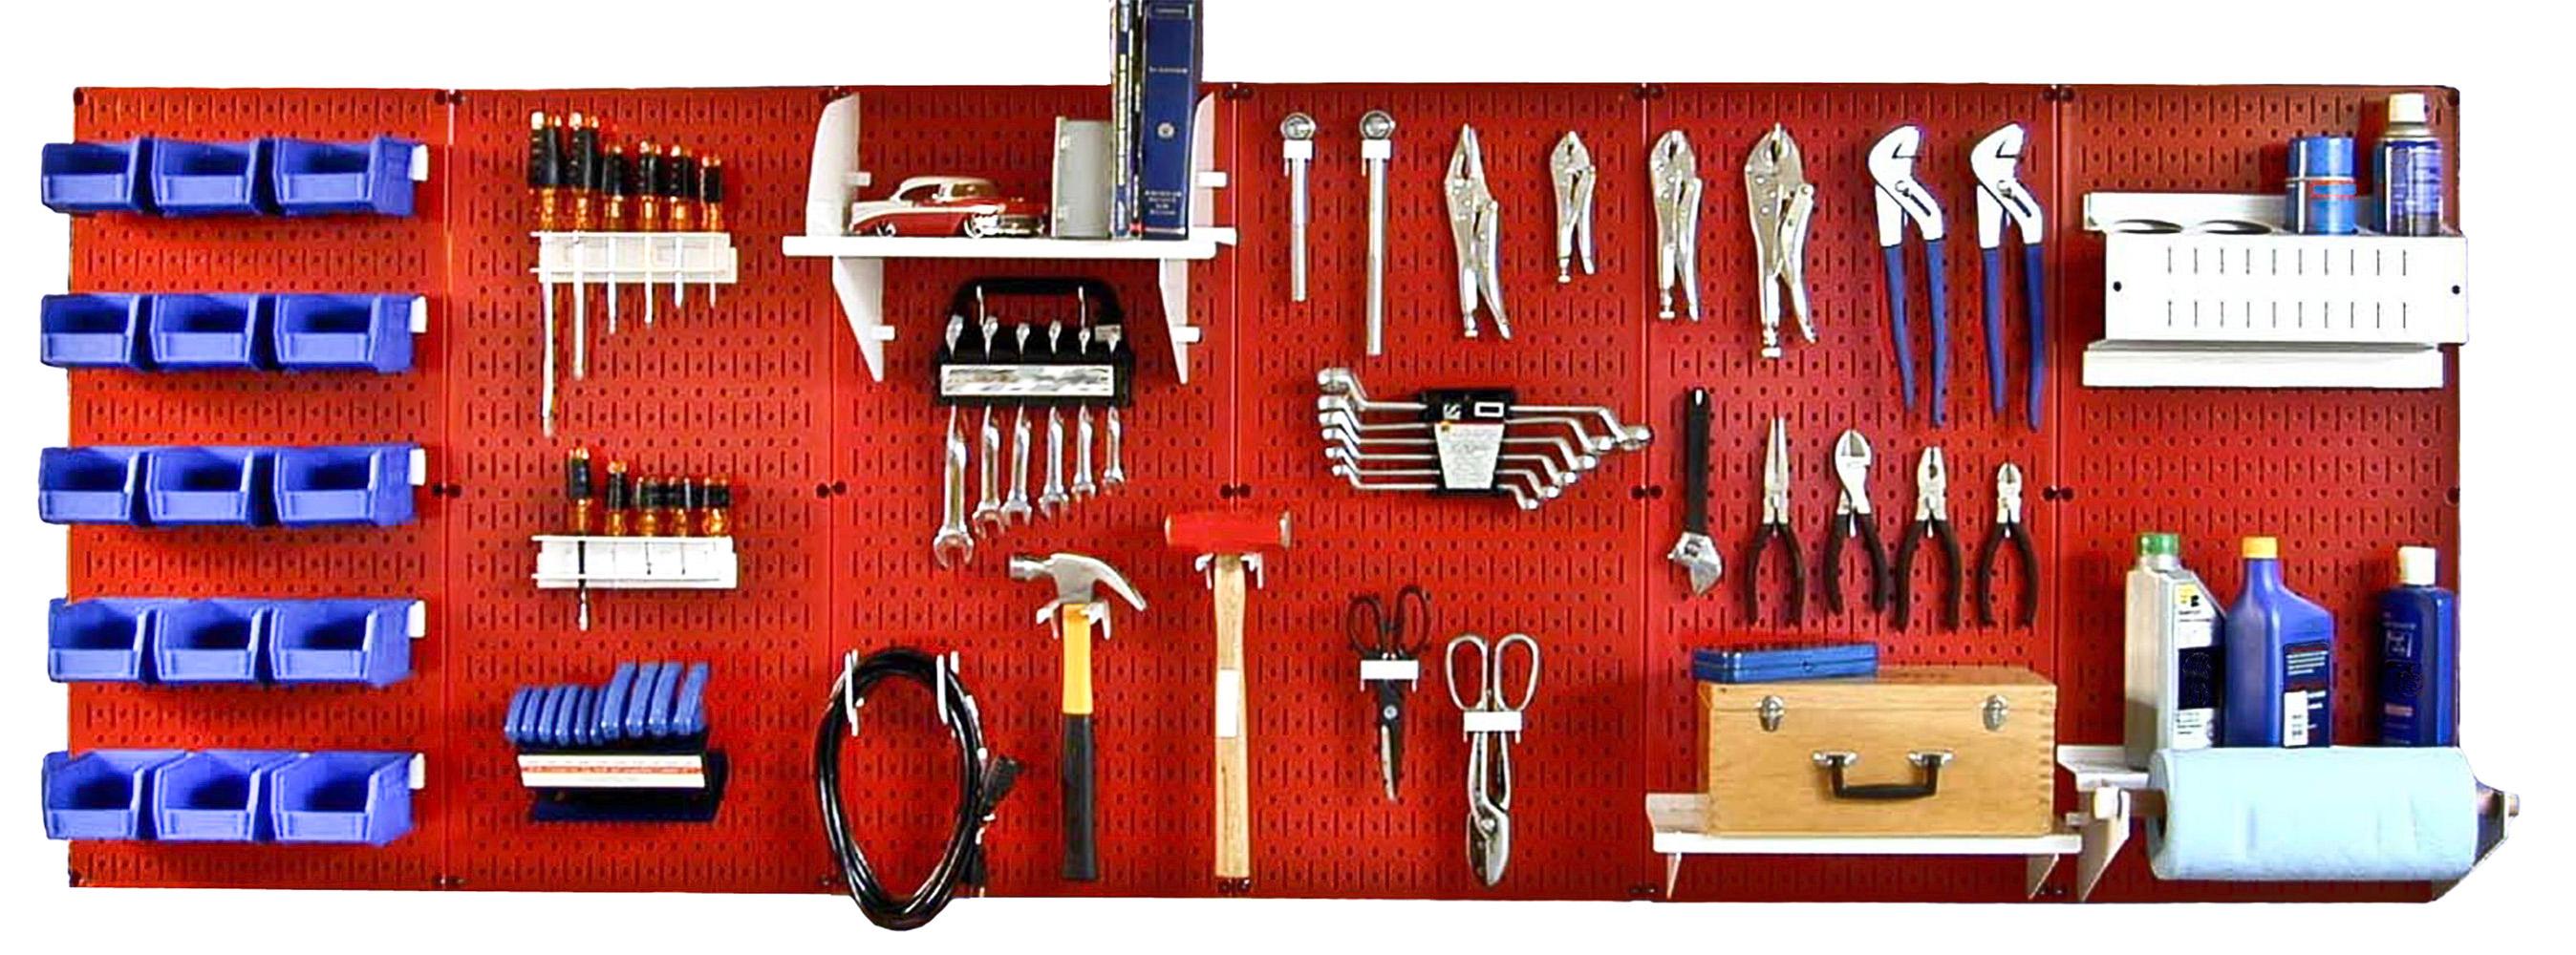 Ключи своими руками в гараже 829